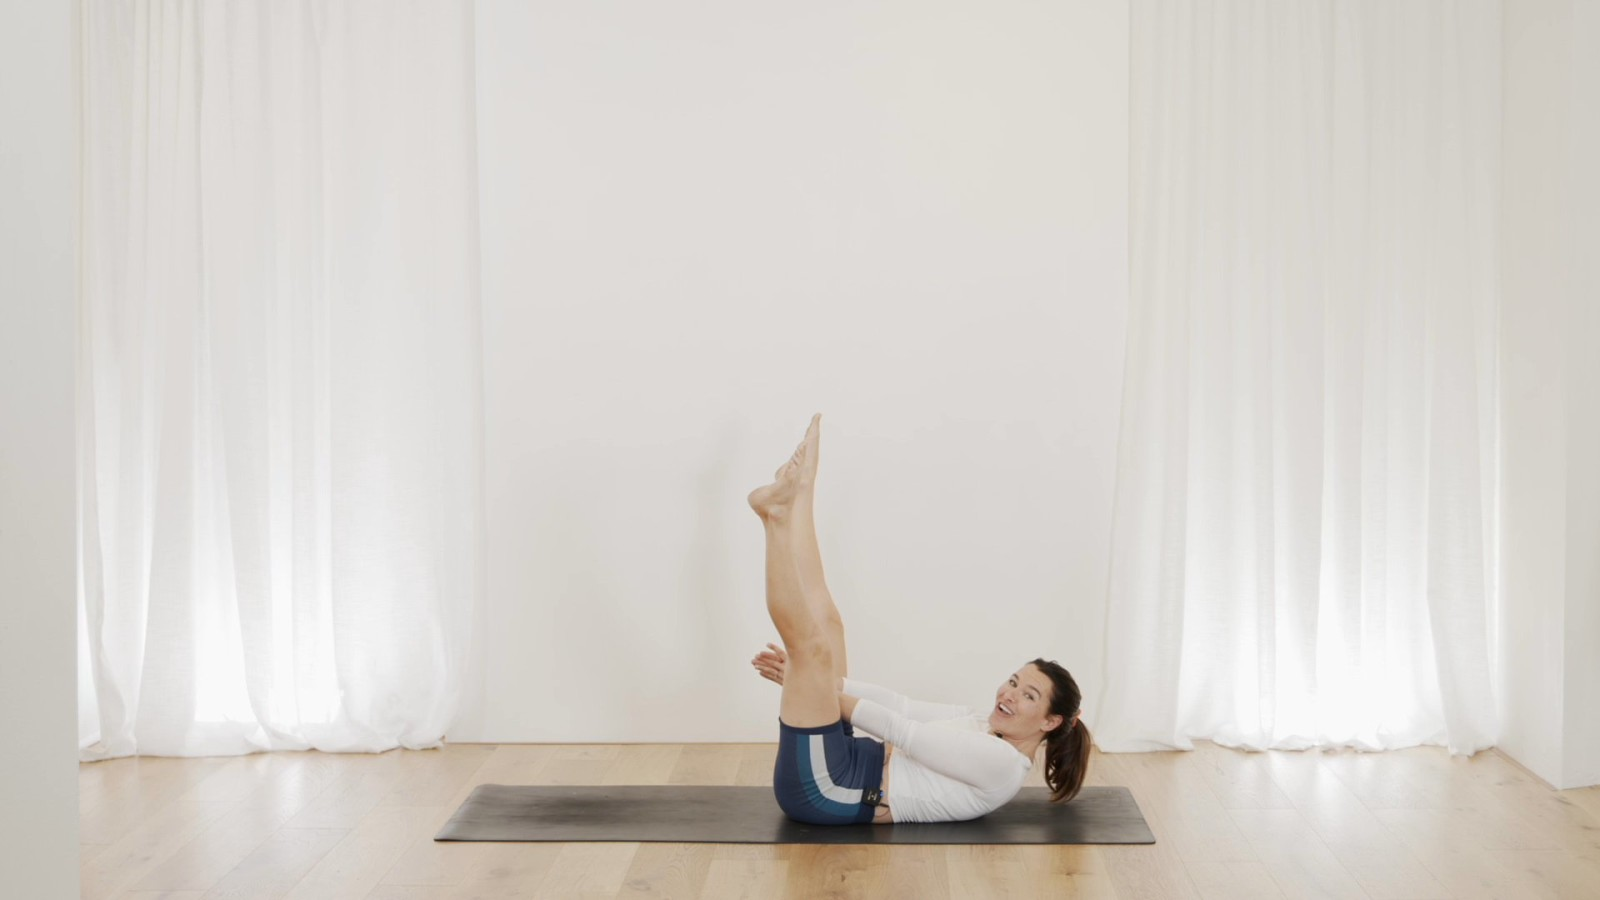 Day 6 Core Challenge 6 of 7 with Aneta Bachanova